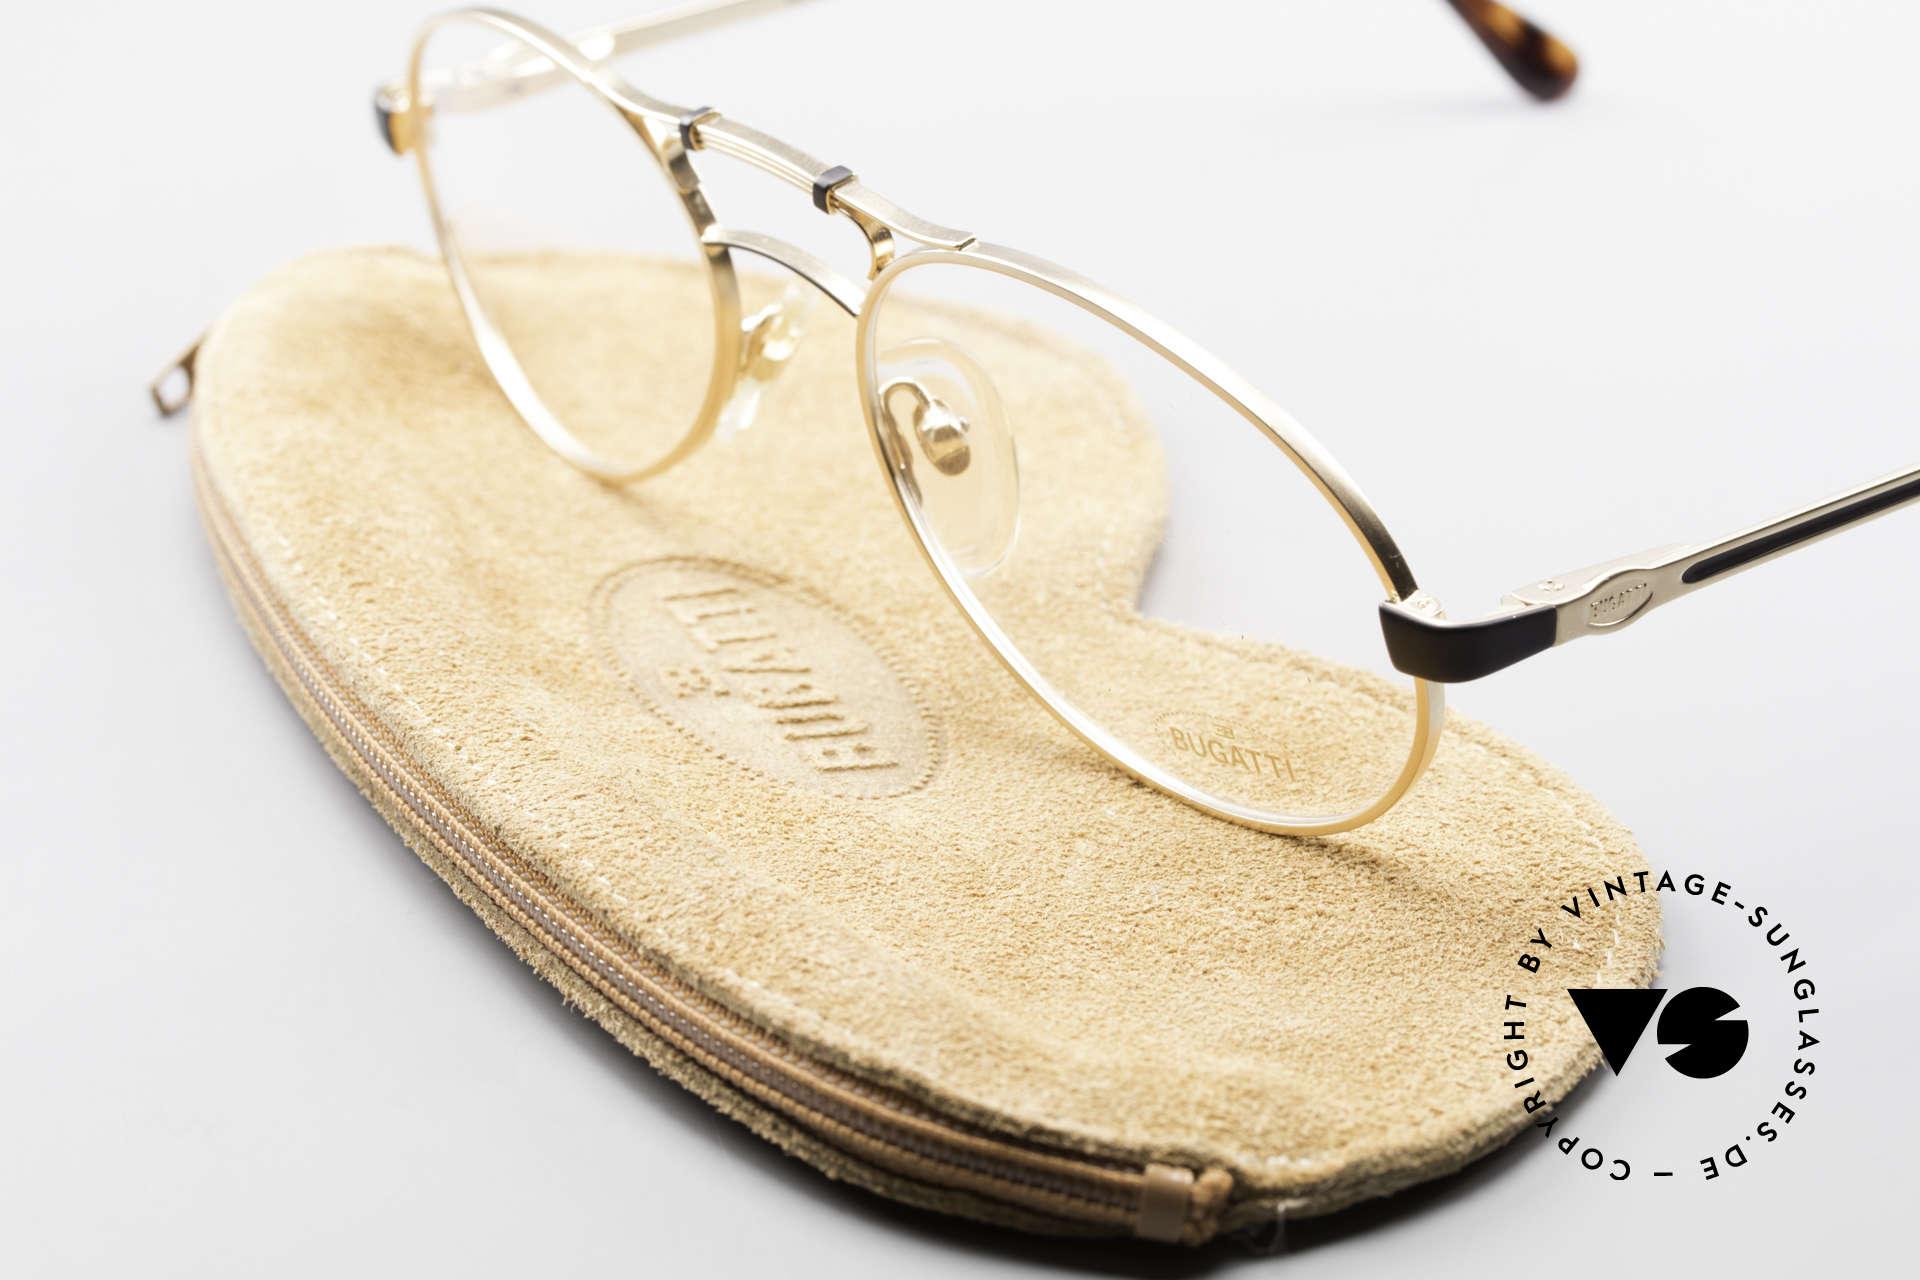 Bugatti 13411 Vintage Men's Eyeglass Frame, NO RETRO EYEWEAR, but a genuine vintage Bugatti!, Made for Men